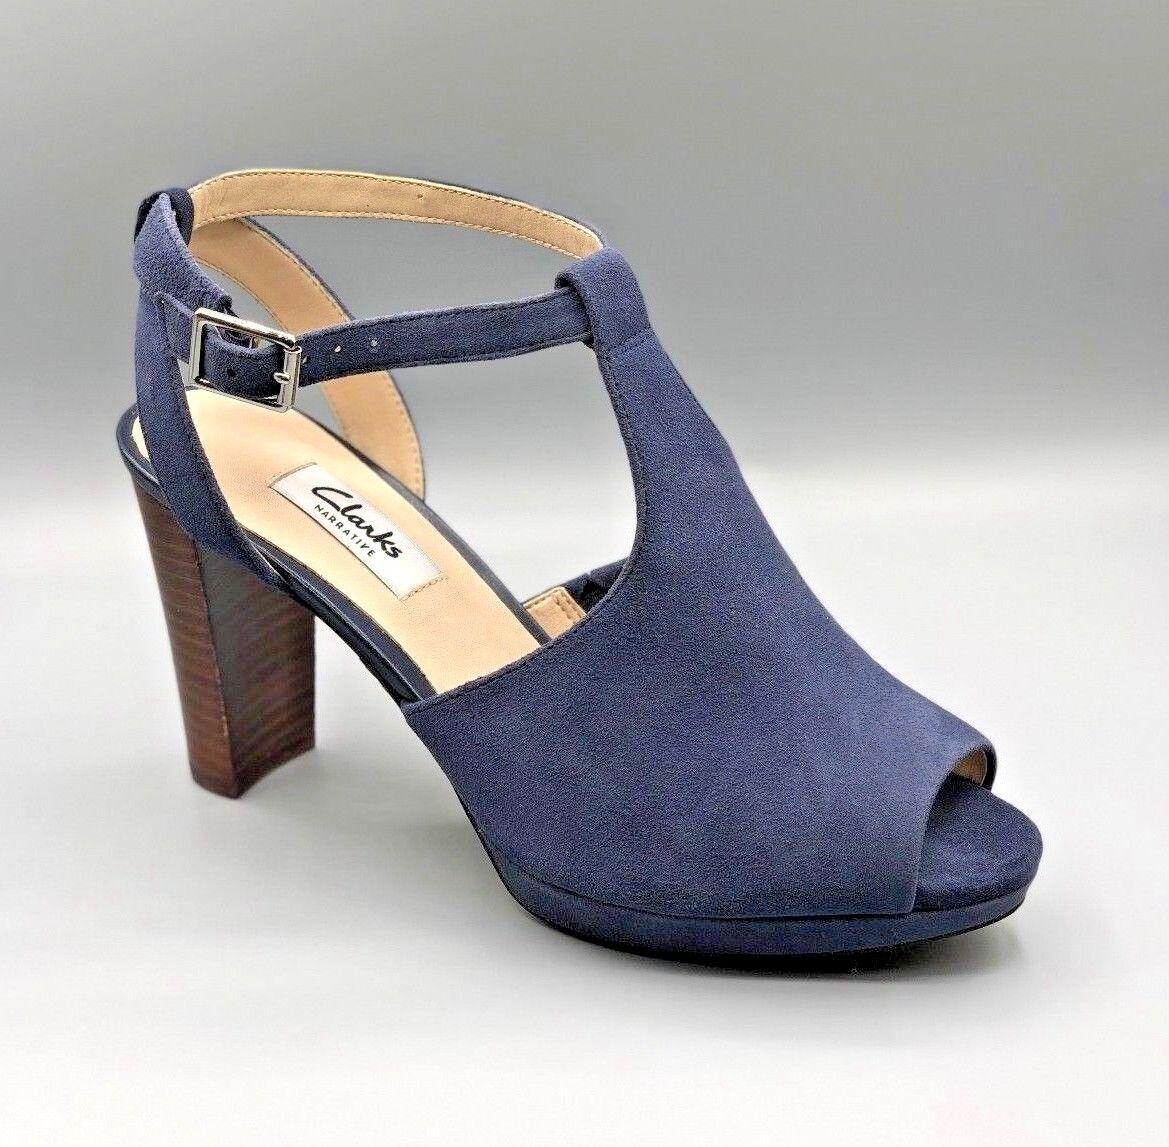 Nuevo Clarks  Kendra encanto encanto encanto  Damas Peep Toe Sandalias De Ante Azul Marino Uk 6 D  sin mínimo